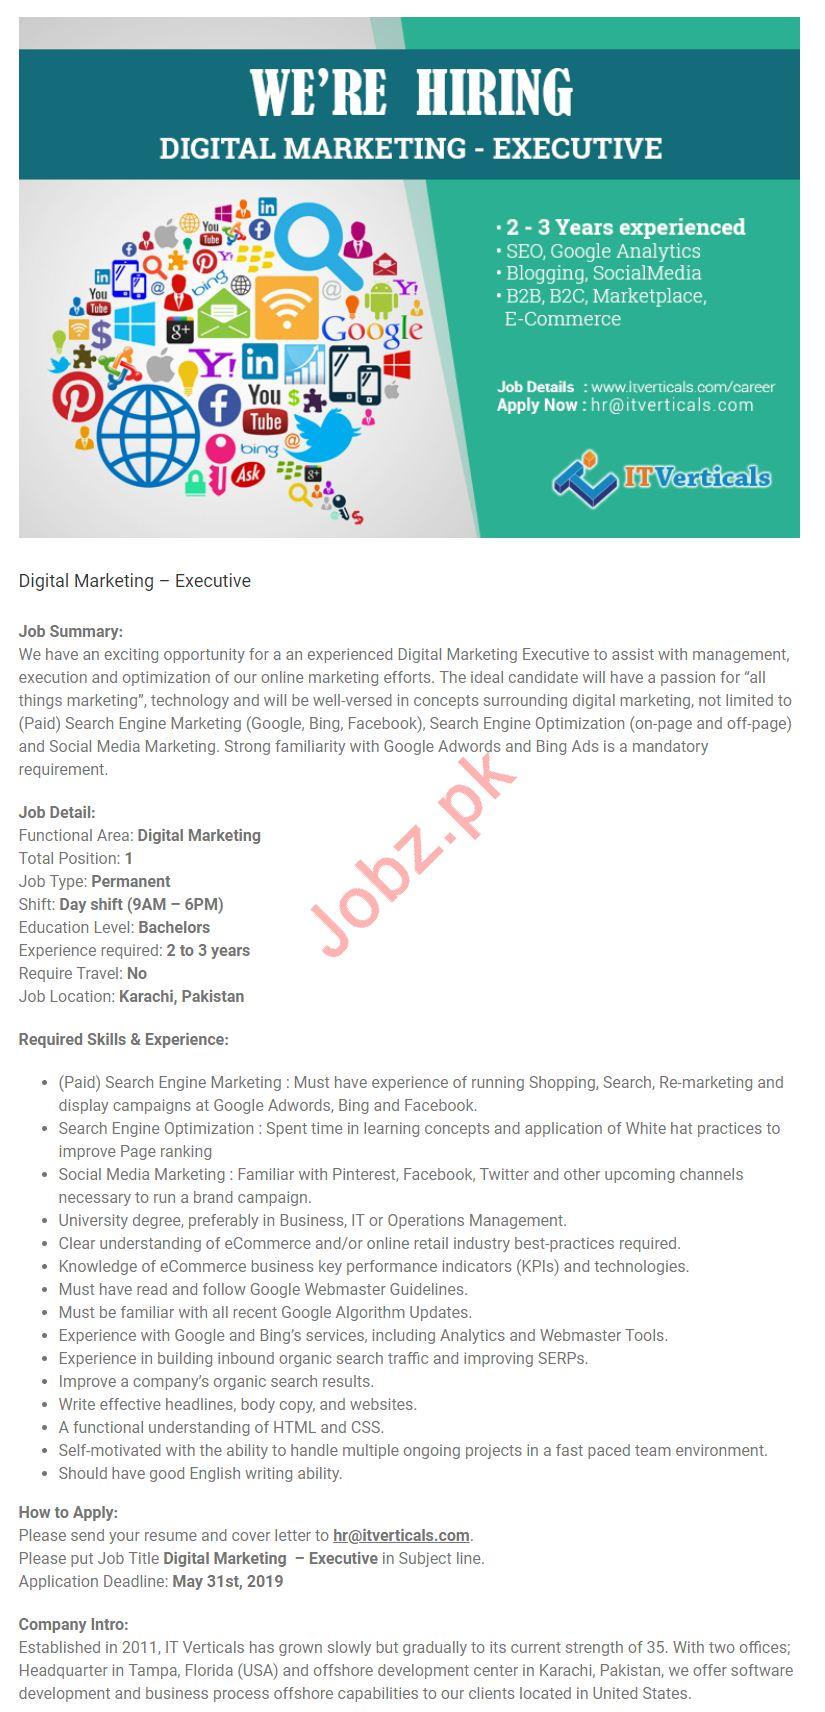 Digital Marketing Executive Job in Karachi